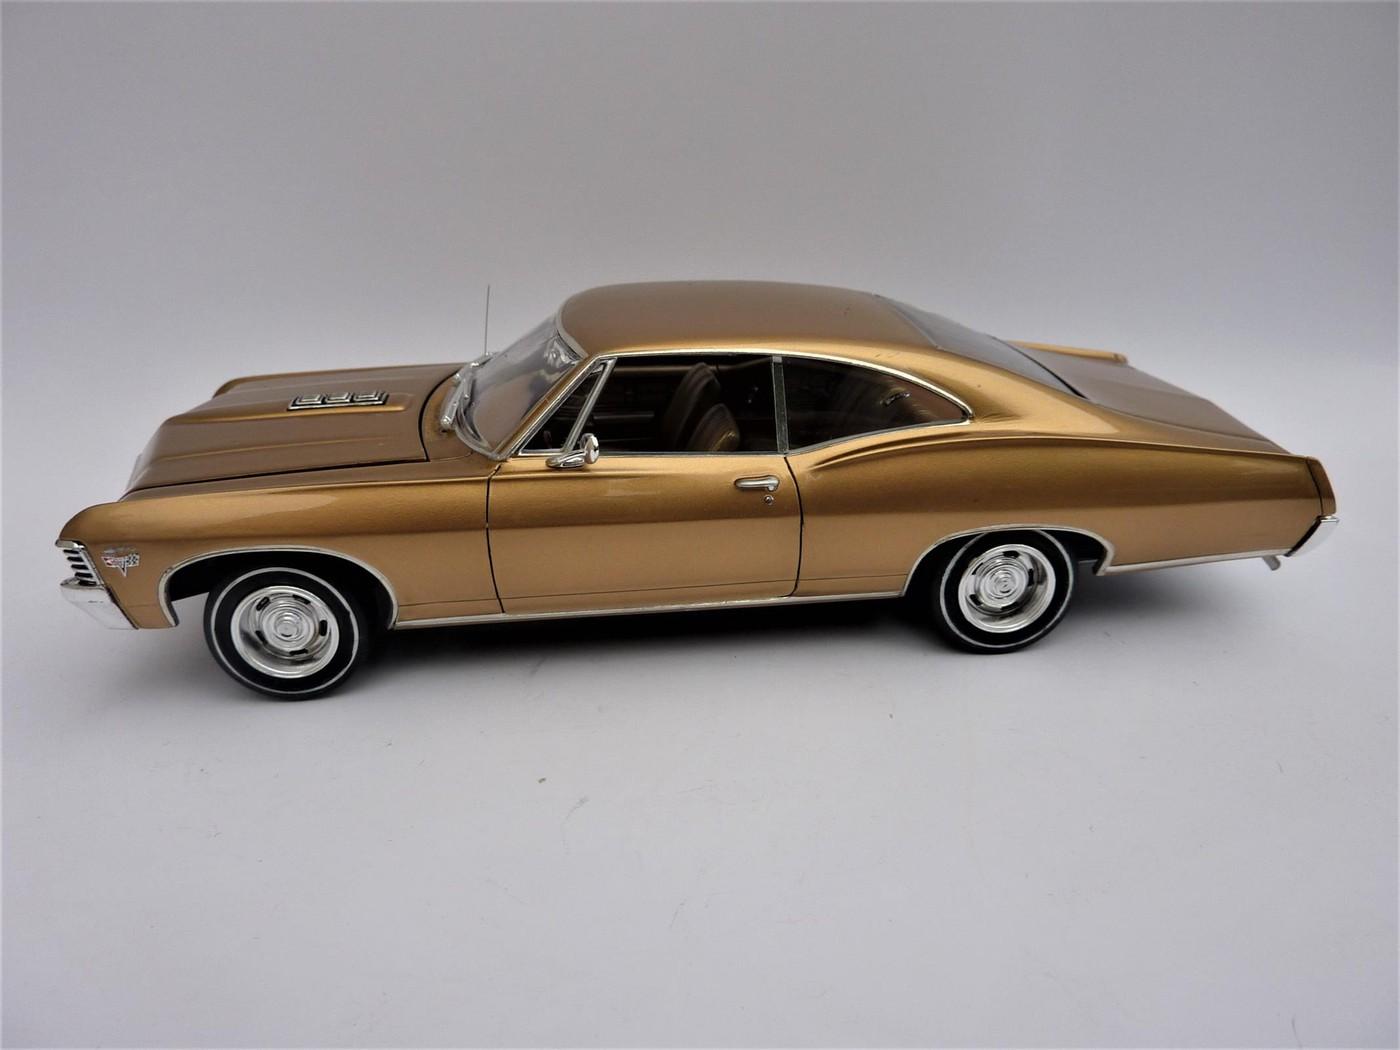 Chevrolet Impala 67 Términée Photo36-vi